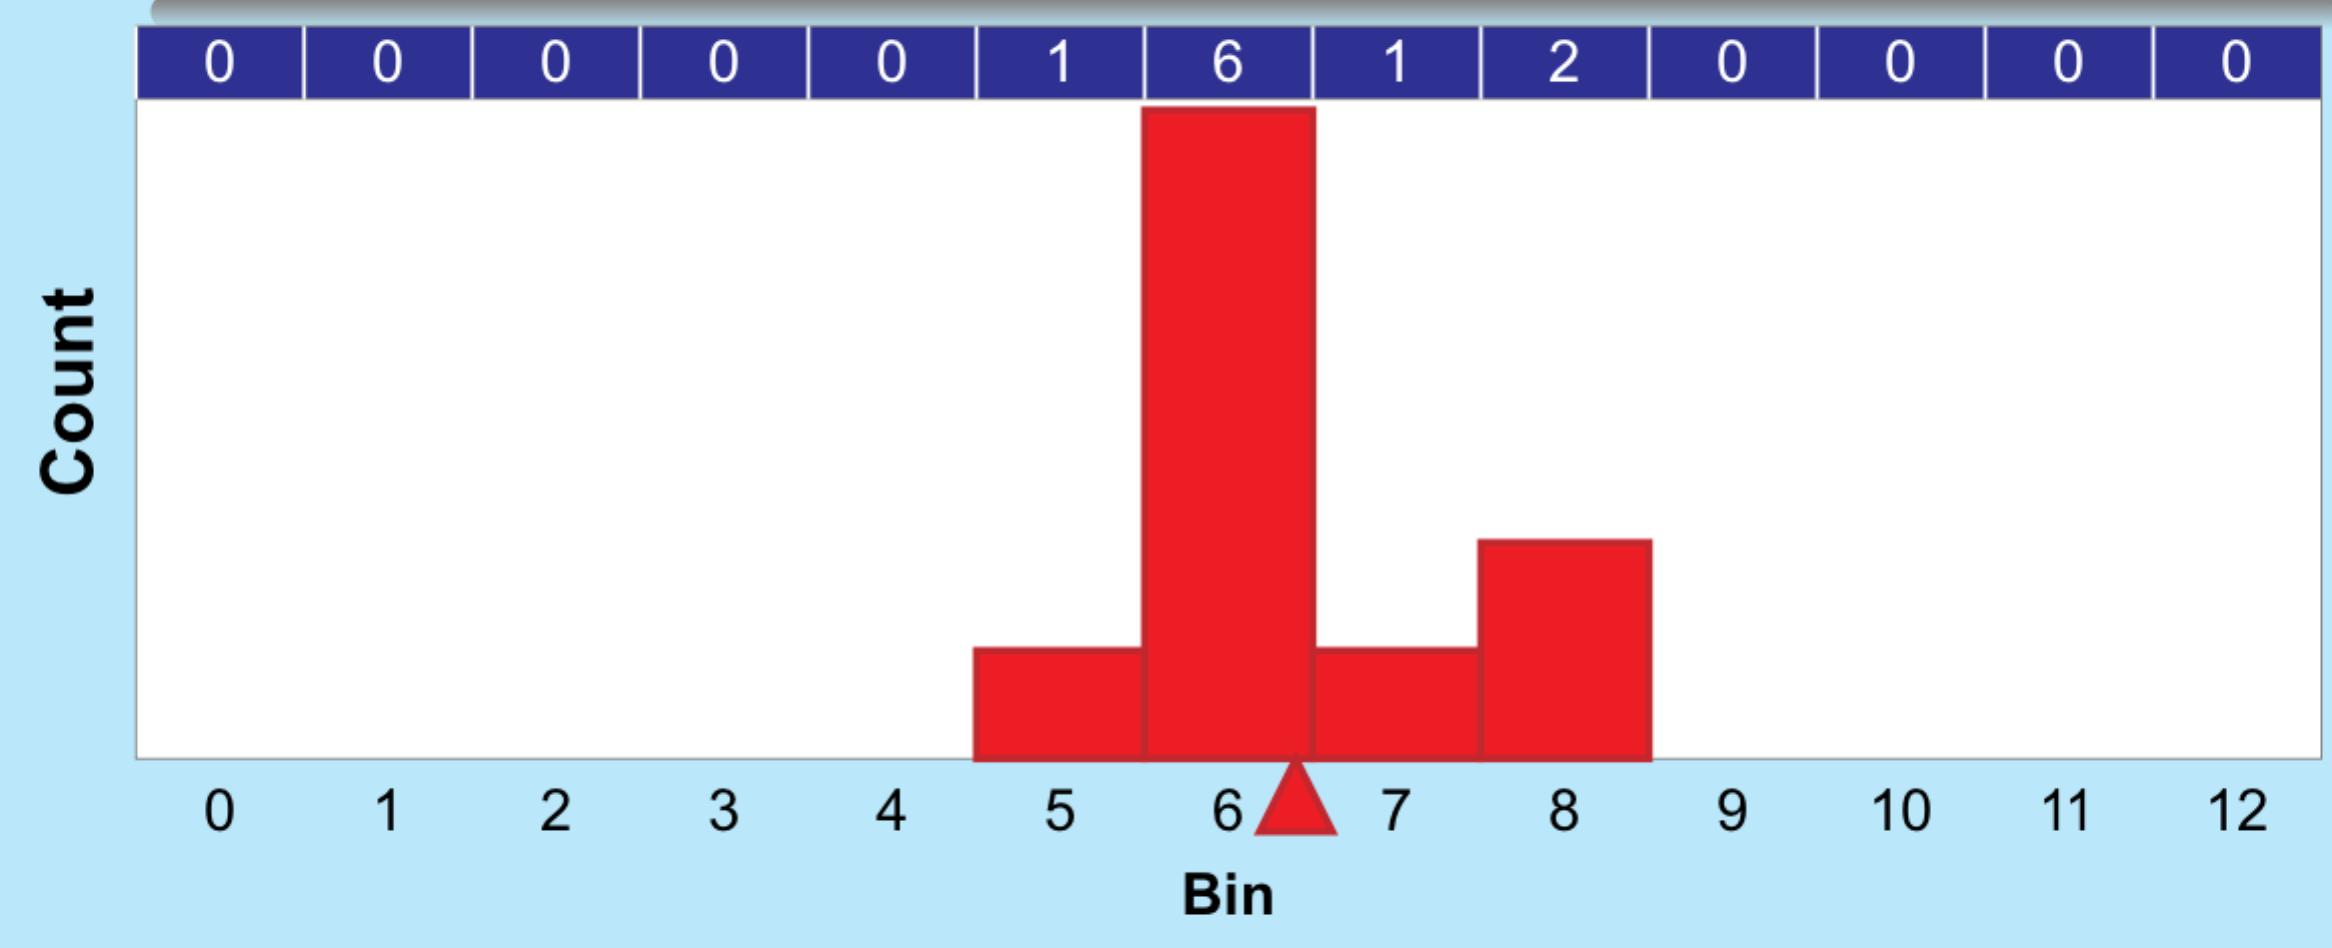 Match Fishtank - Algebra II - Unit 8: Probability and